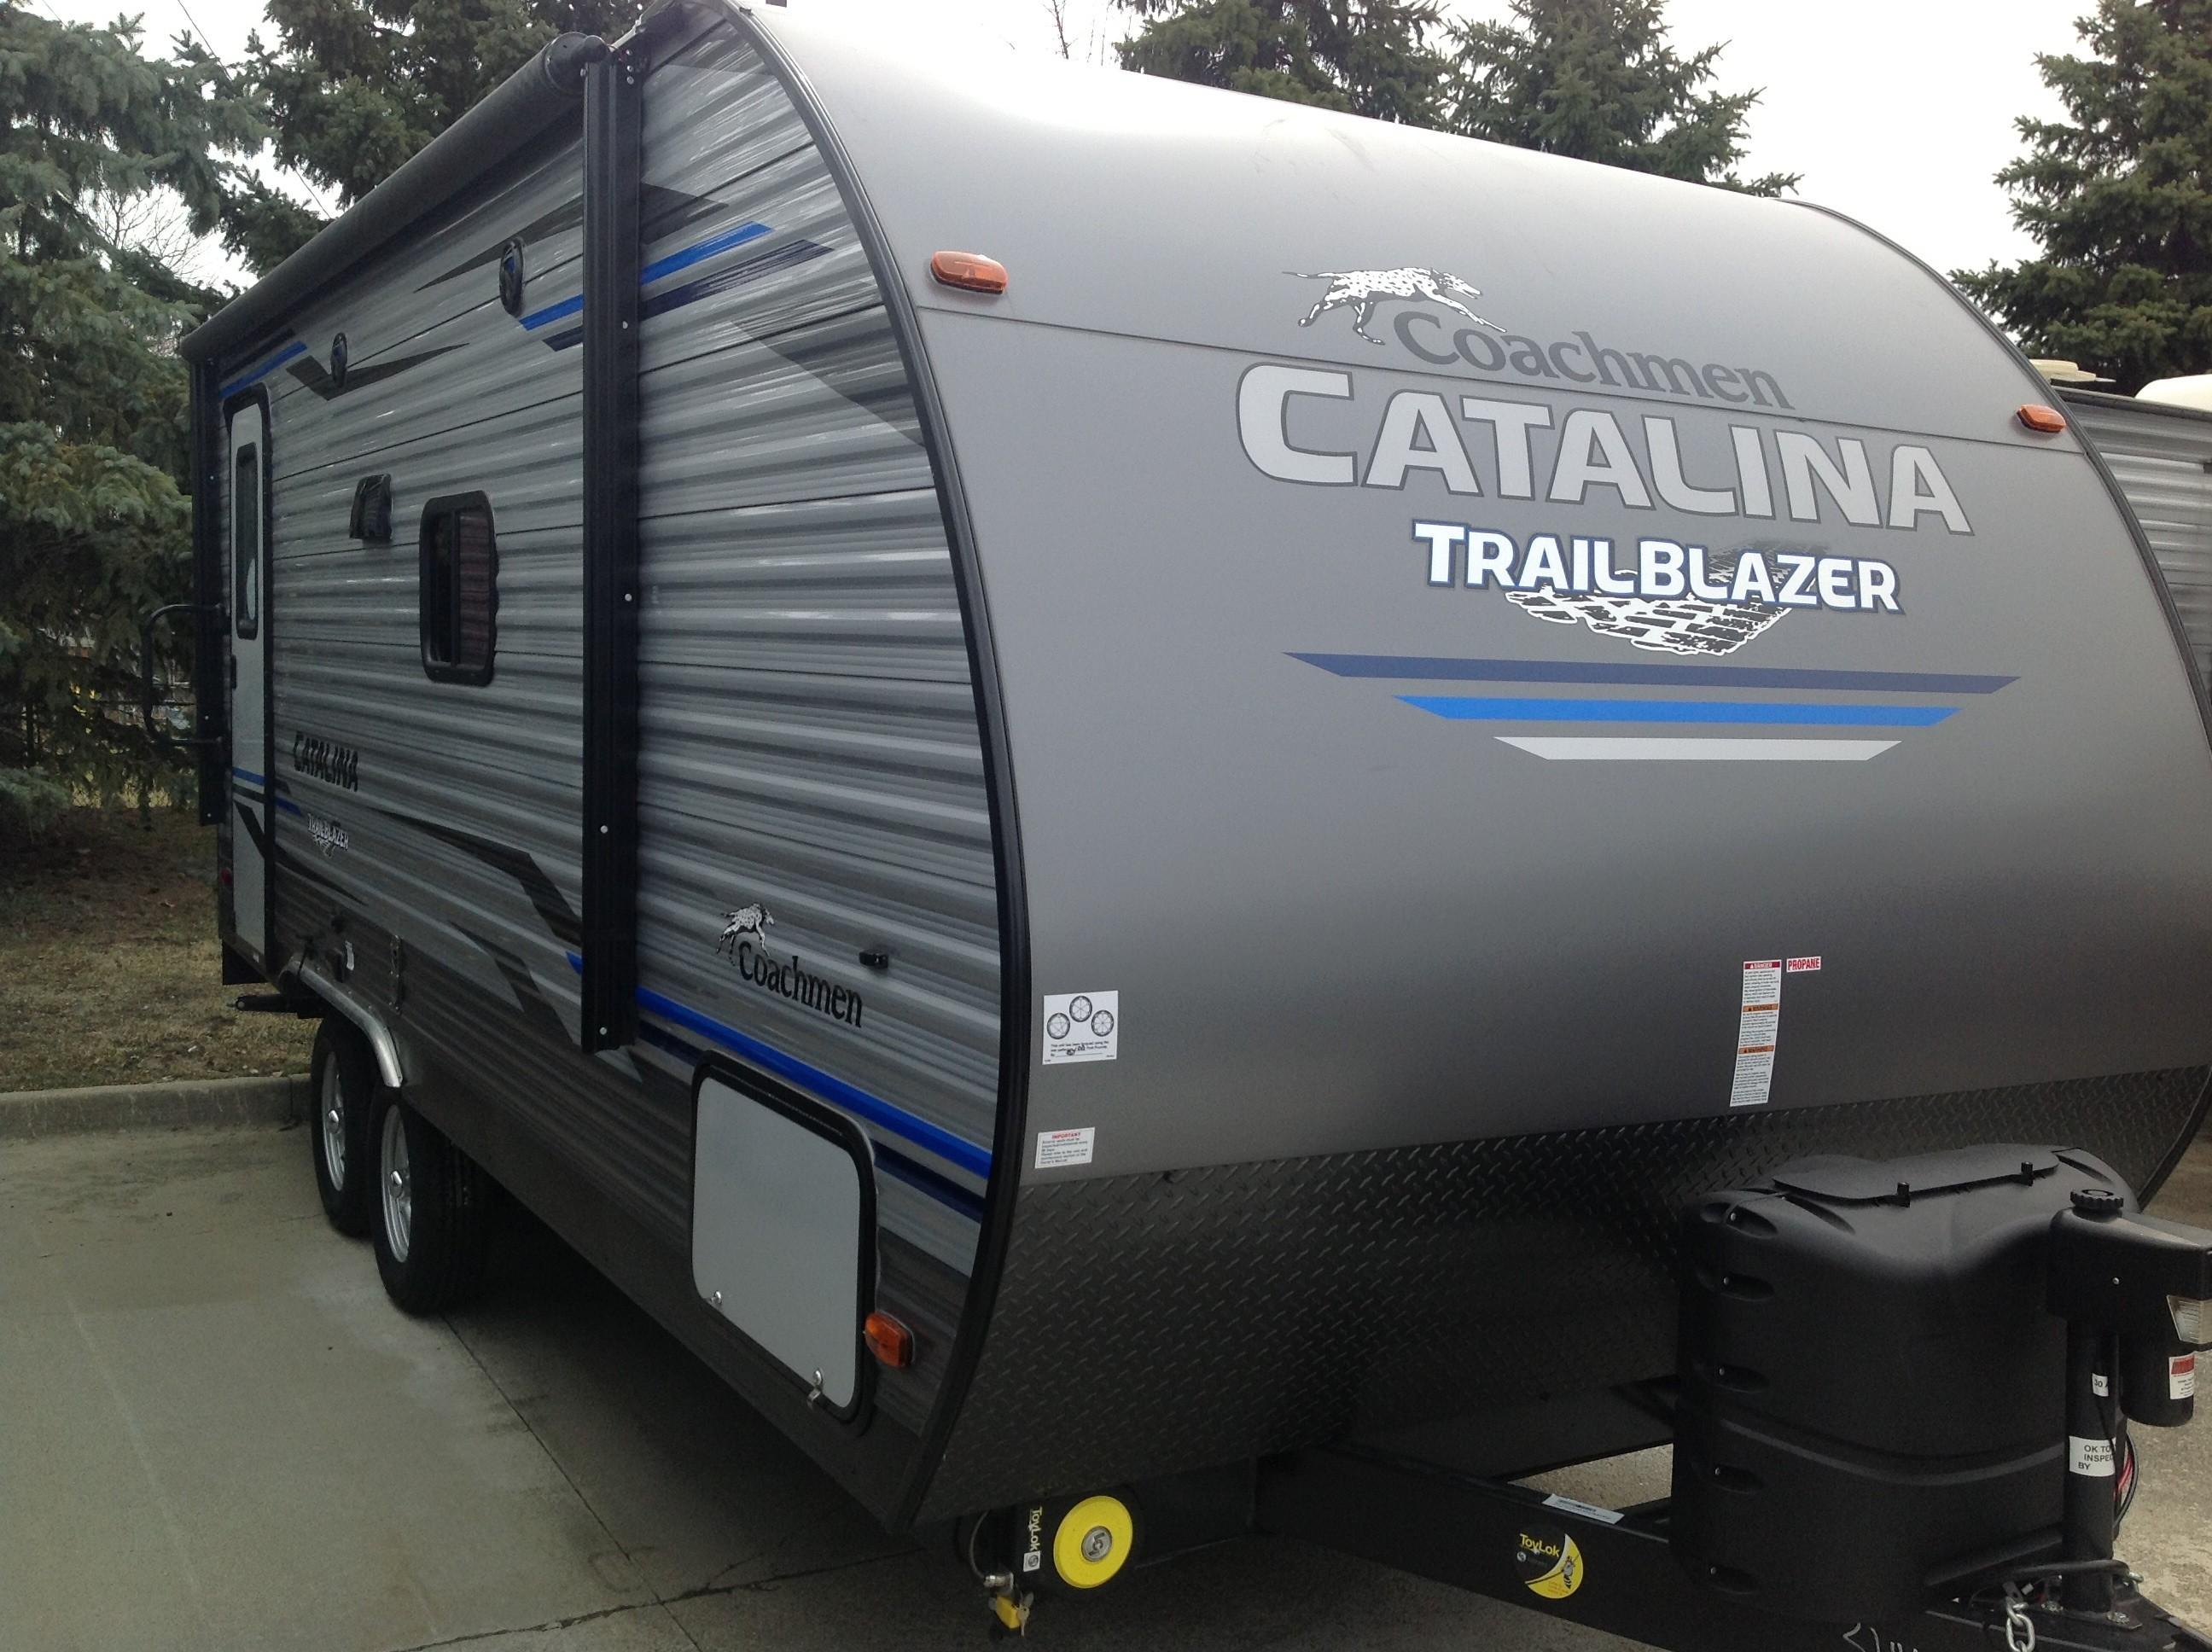 New, 2019, Coachmen, Catalina Trailblazer 19TH, Toy Haulers